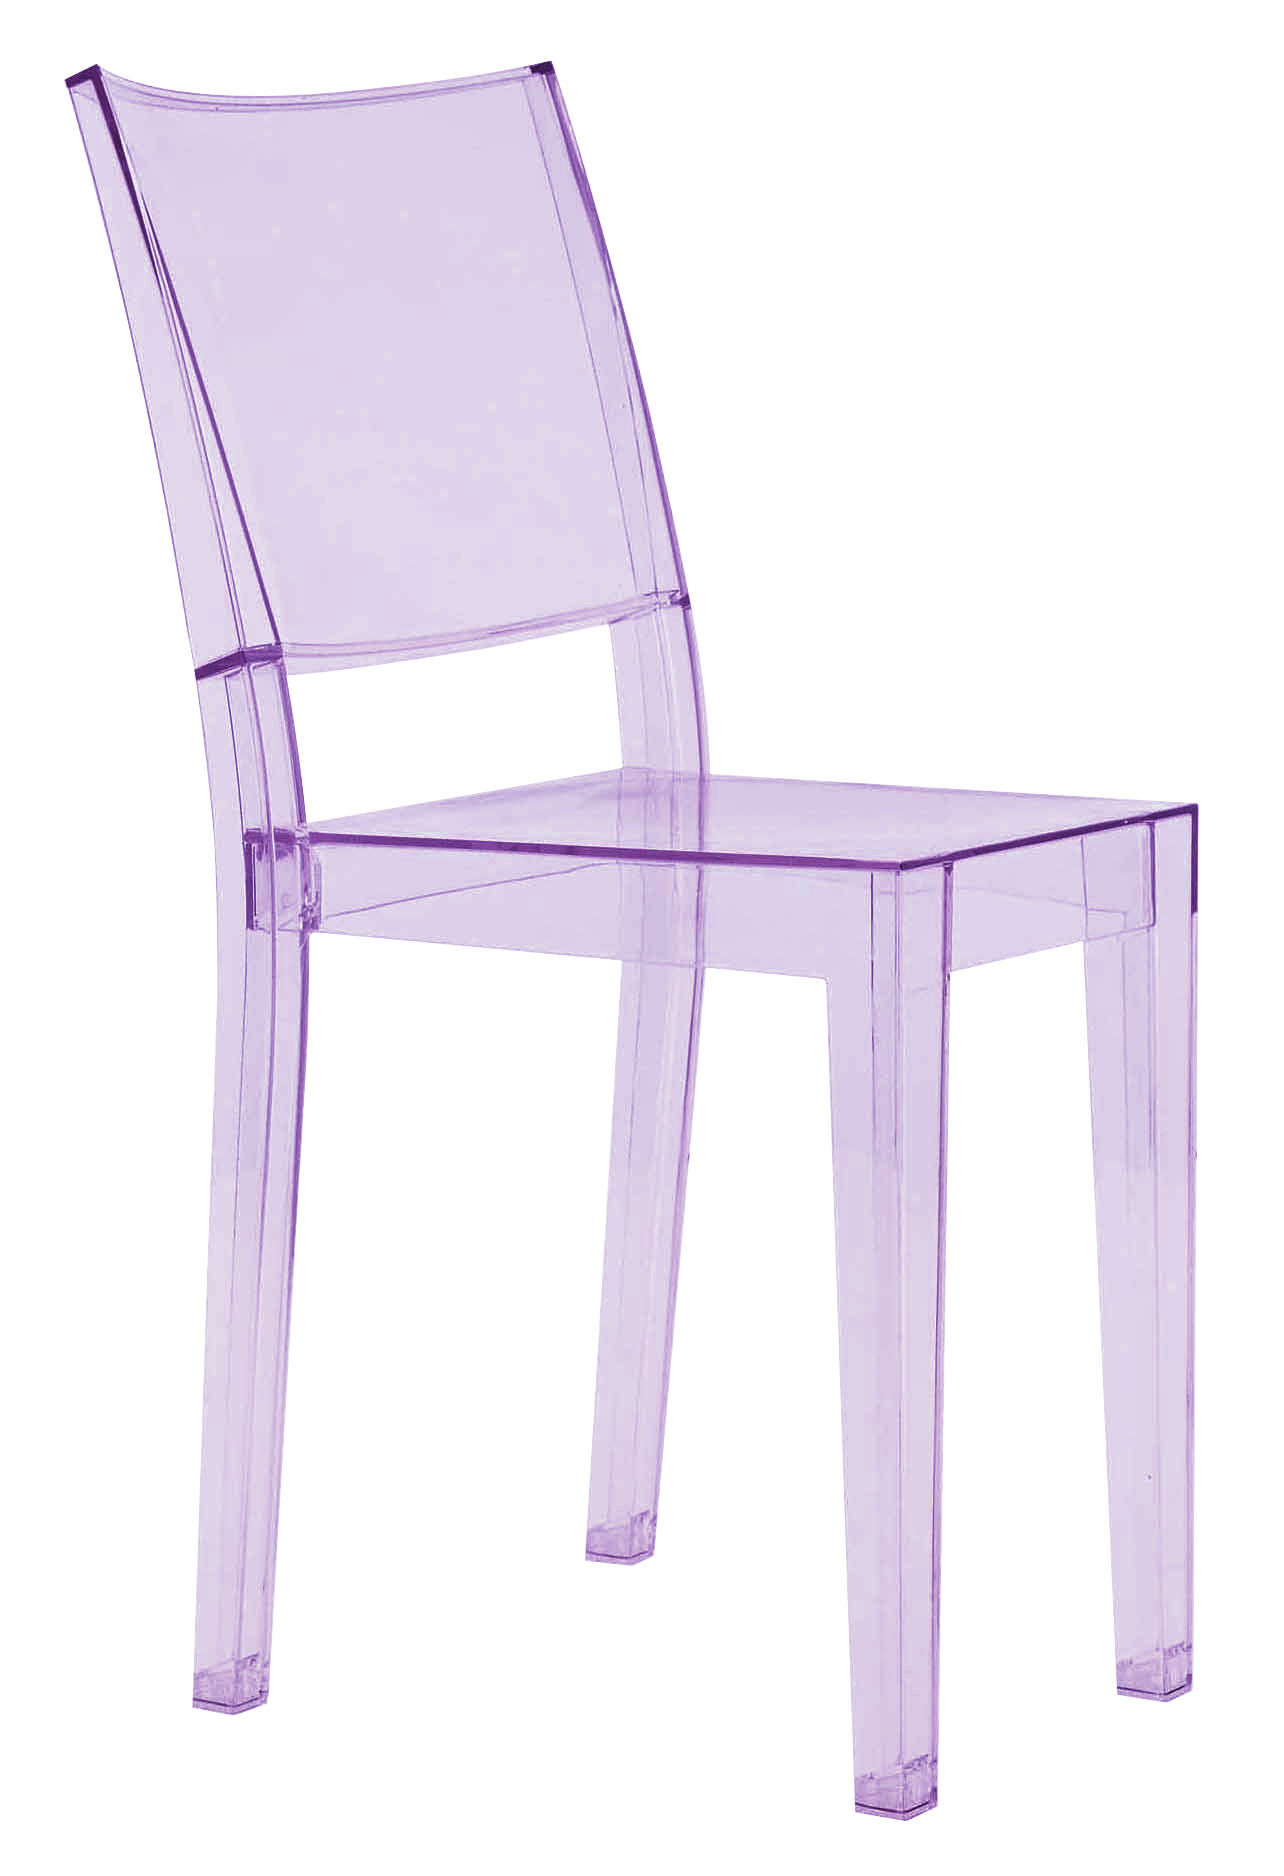 chaise empilable la marie polycarbonate violet kartell. Black Bedroom Furniture Sets. Home Design Ideas